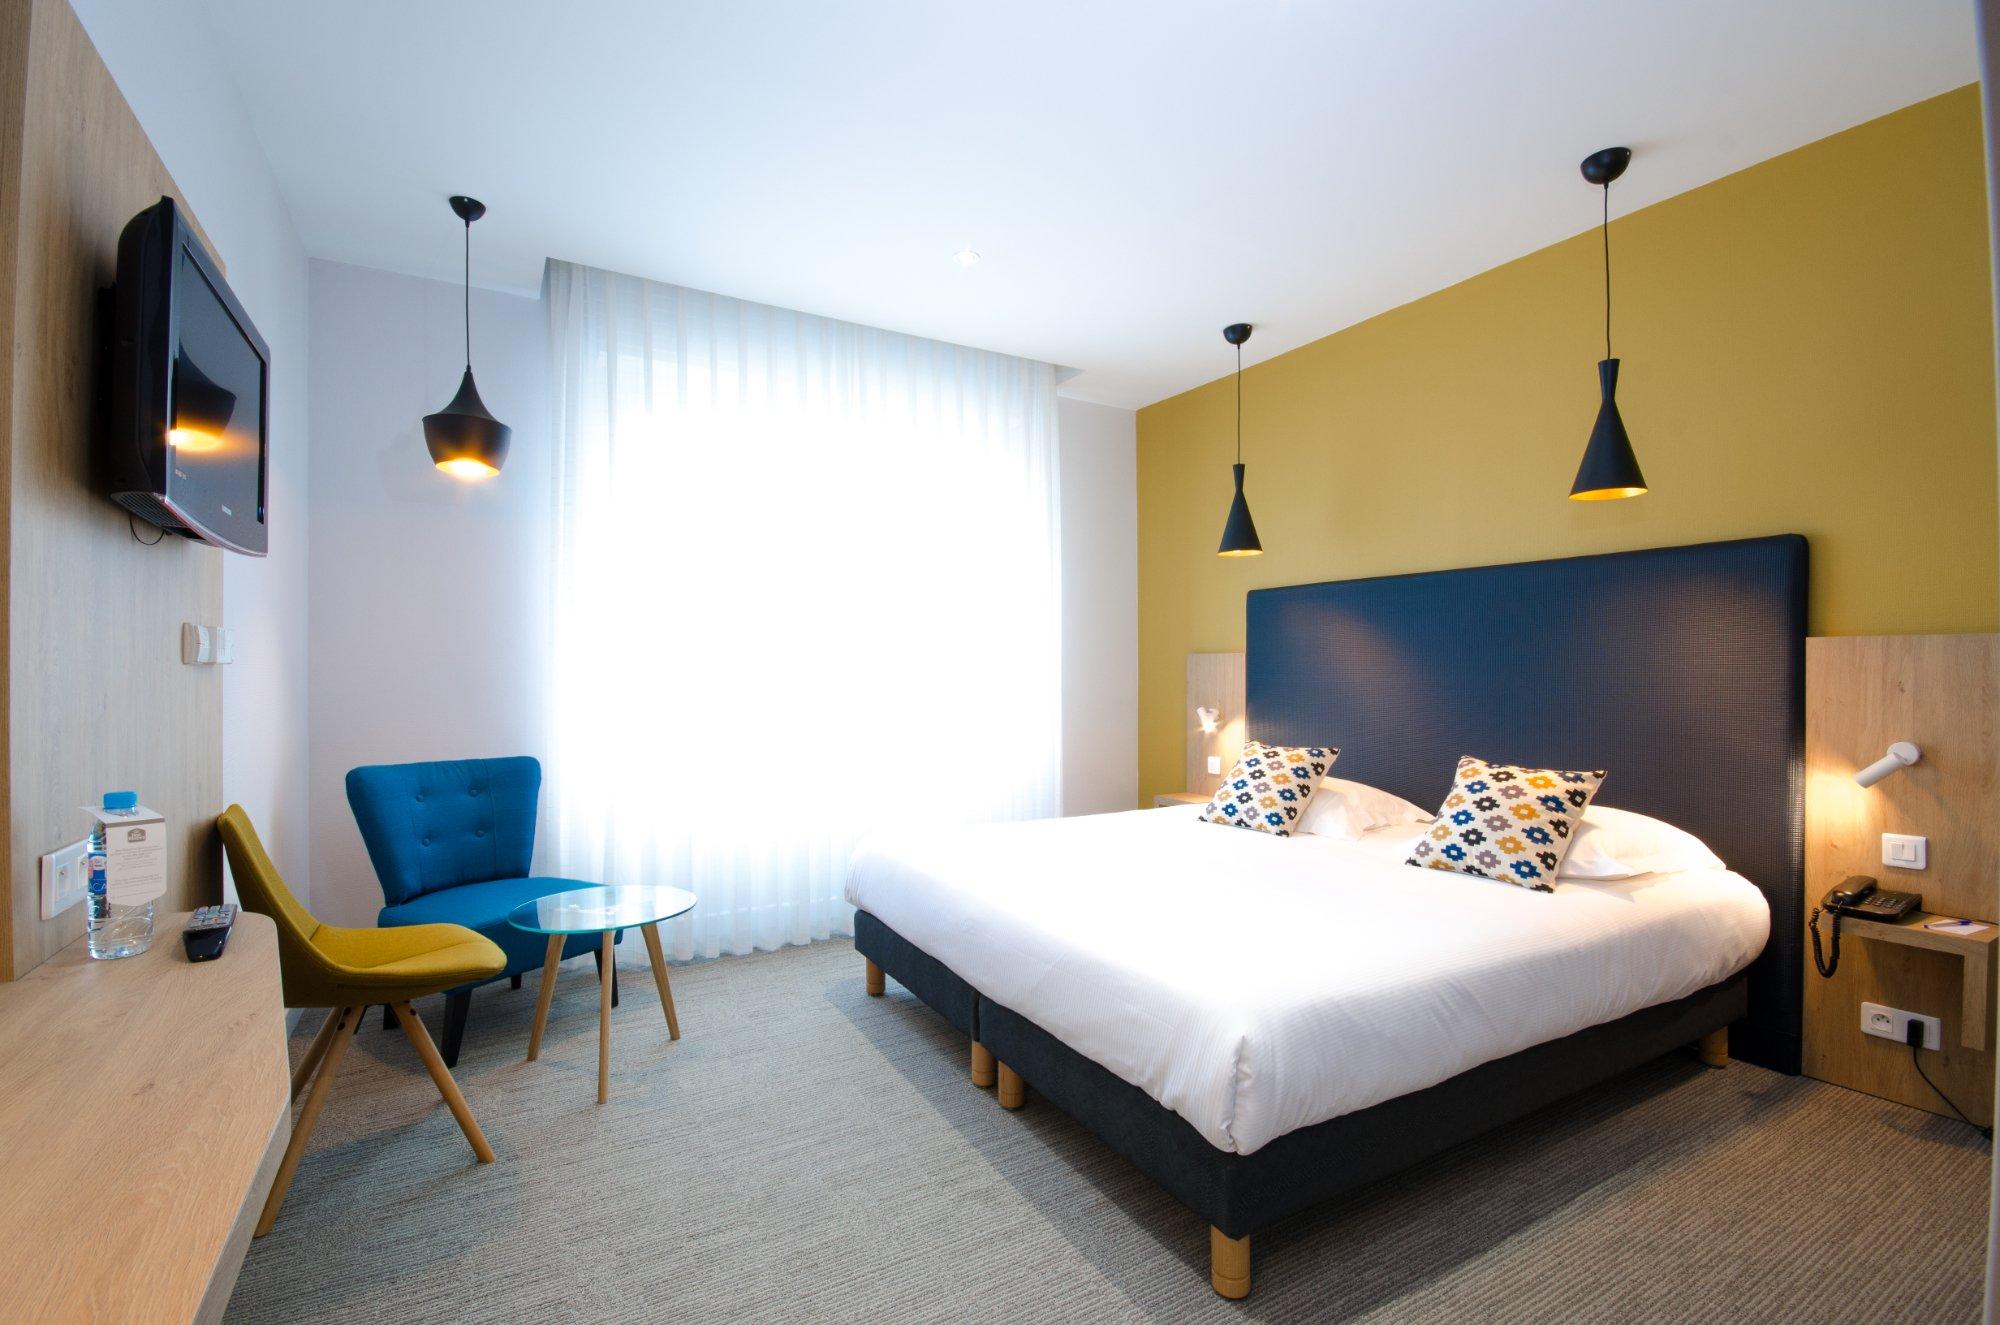 BEST WESTERN Hotel Plaisance - Villefranche-sur-Saone